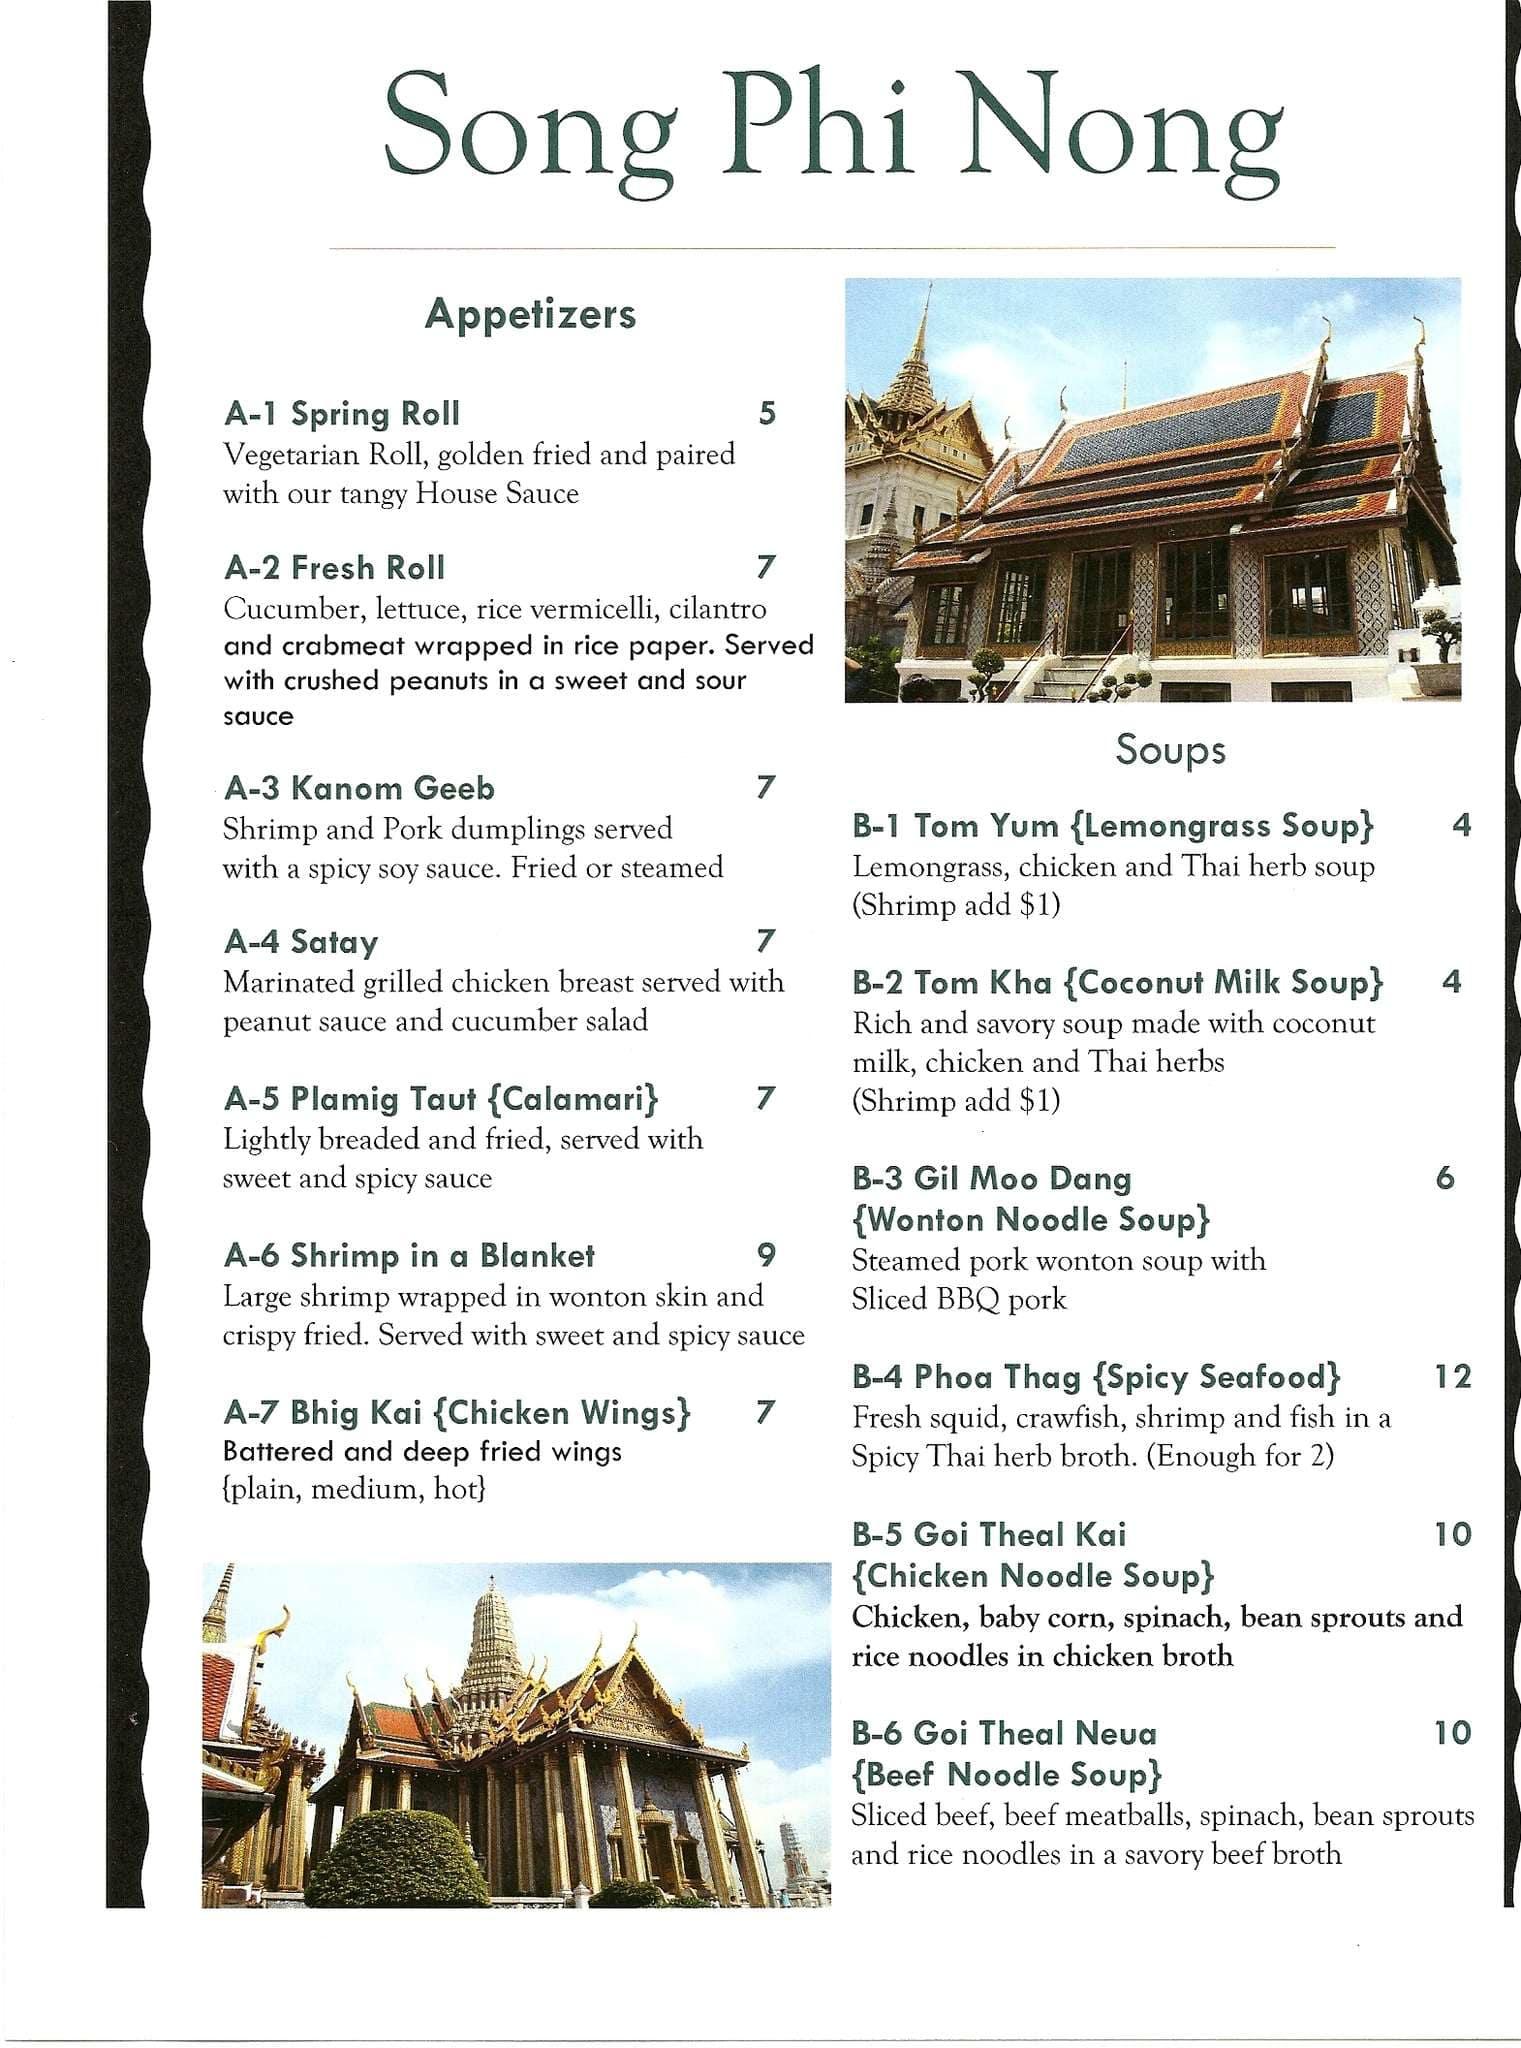 Song Phi Nong Thai Restaurant Menu - Urbanspoon/Zomato